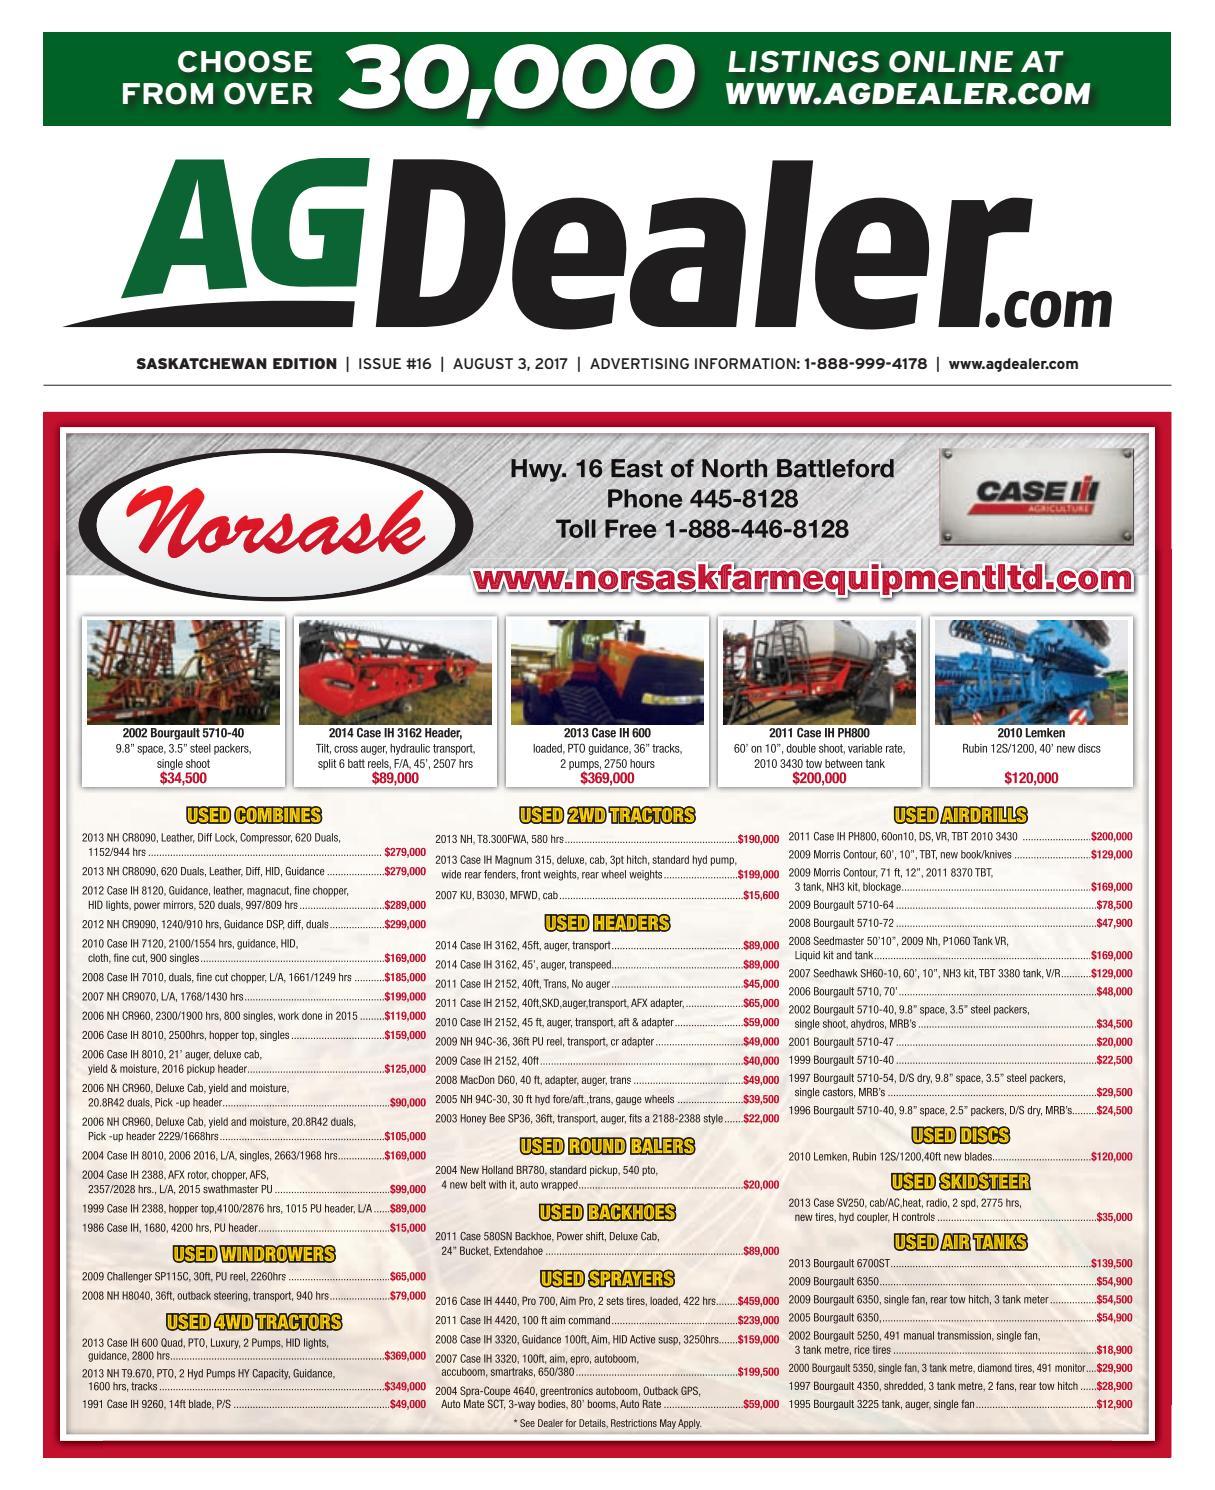 # 2 Minnesota Transfer  Sales Book Co .Fine Farm Implements Cat Grain-KIng Mfg